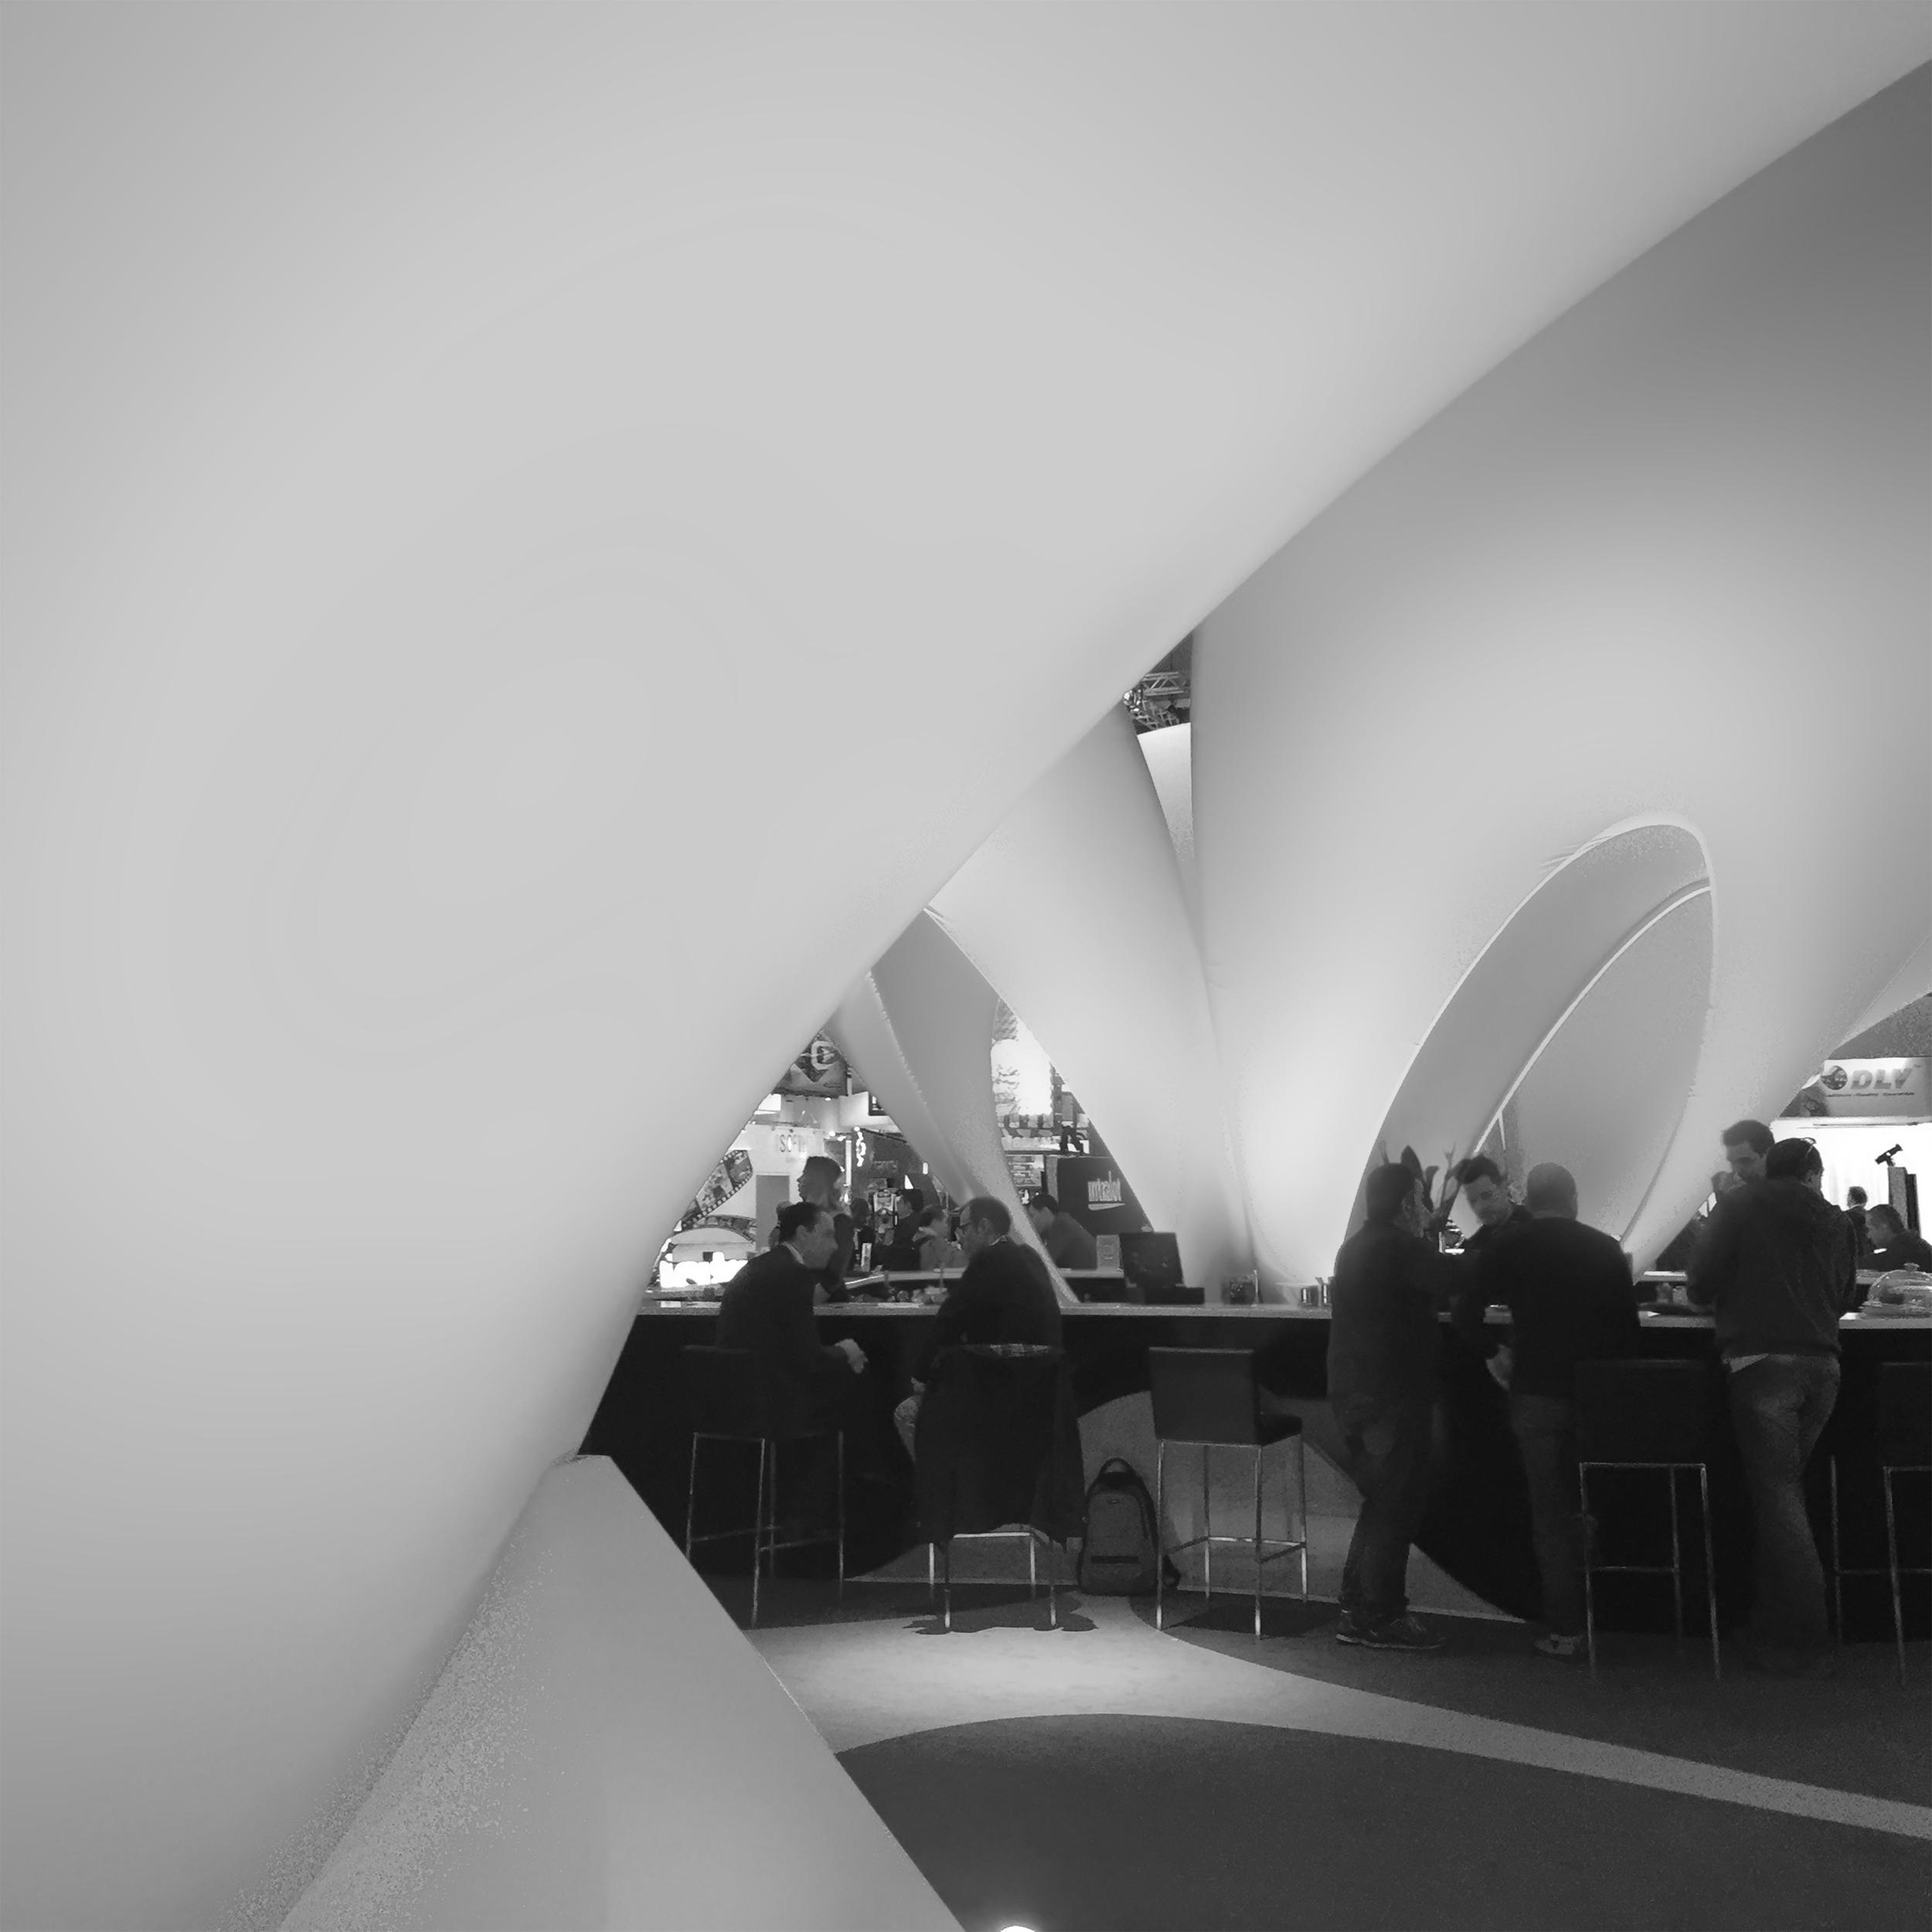 IconicPavilion_3sm.jpg